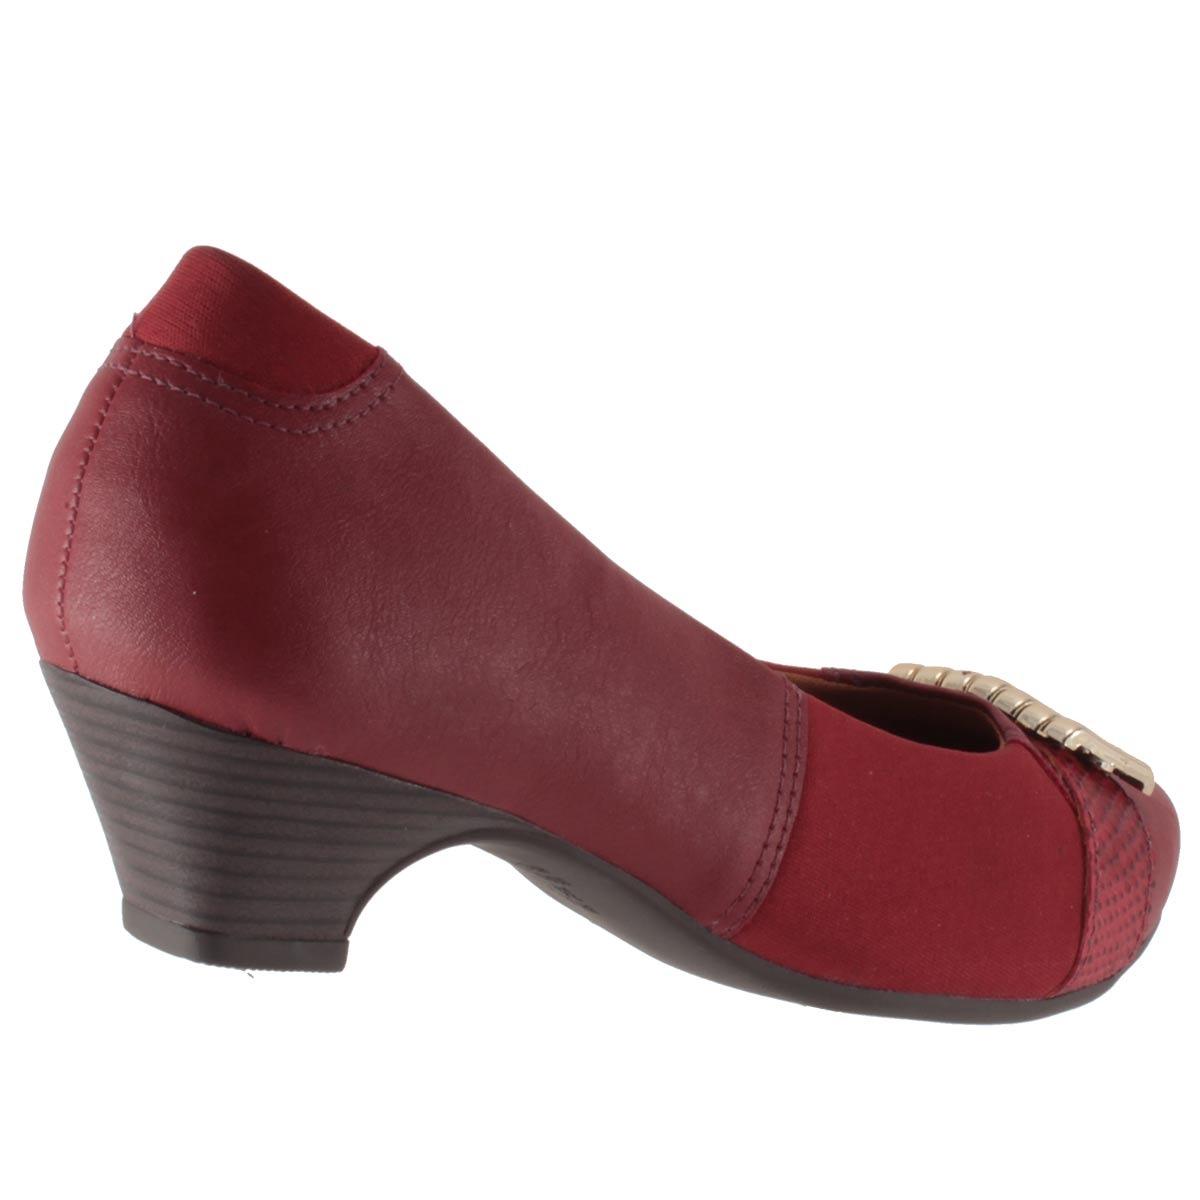 6c3152ccd6 sapato scarpin campesí salto baixo metal joanete lindo l5451. Carregando  zoom.